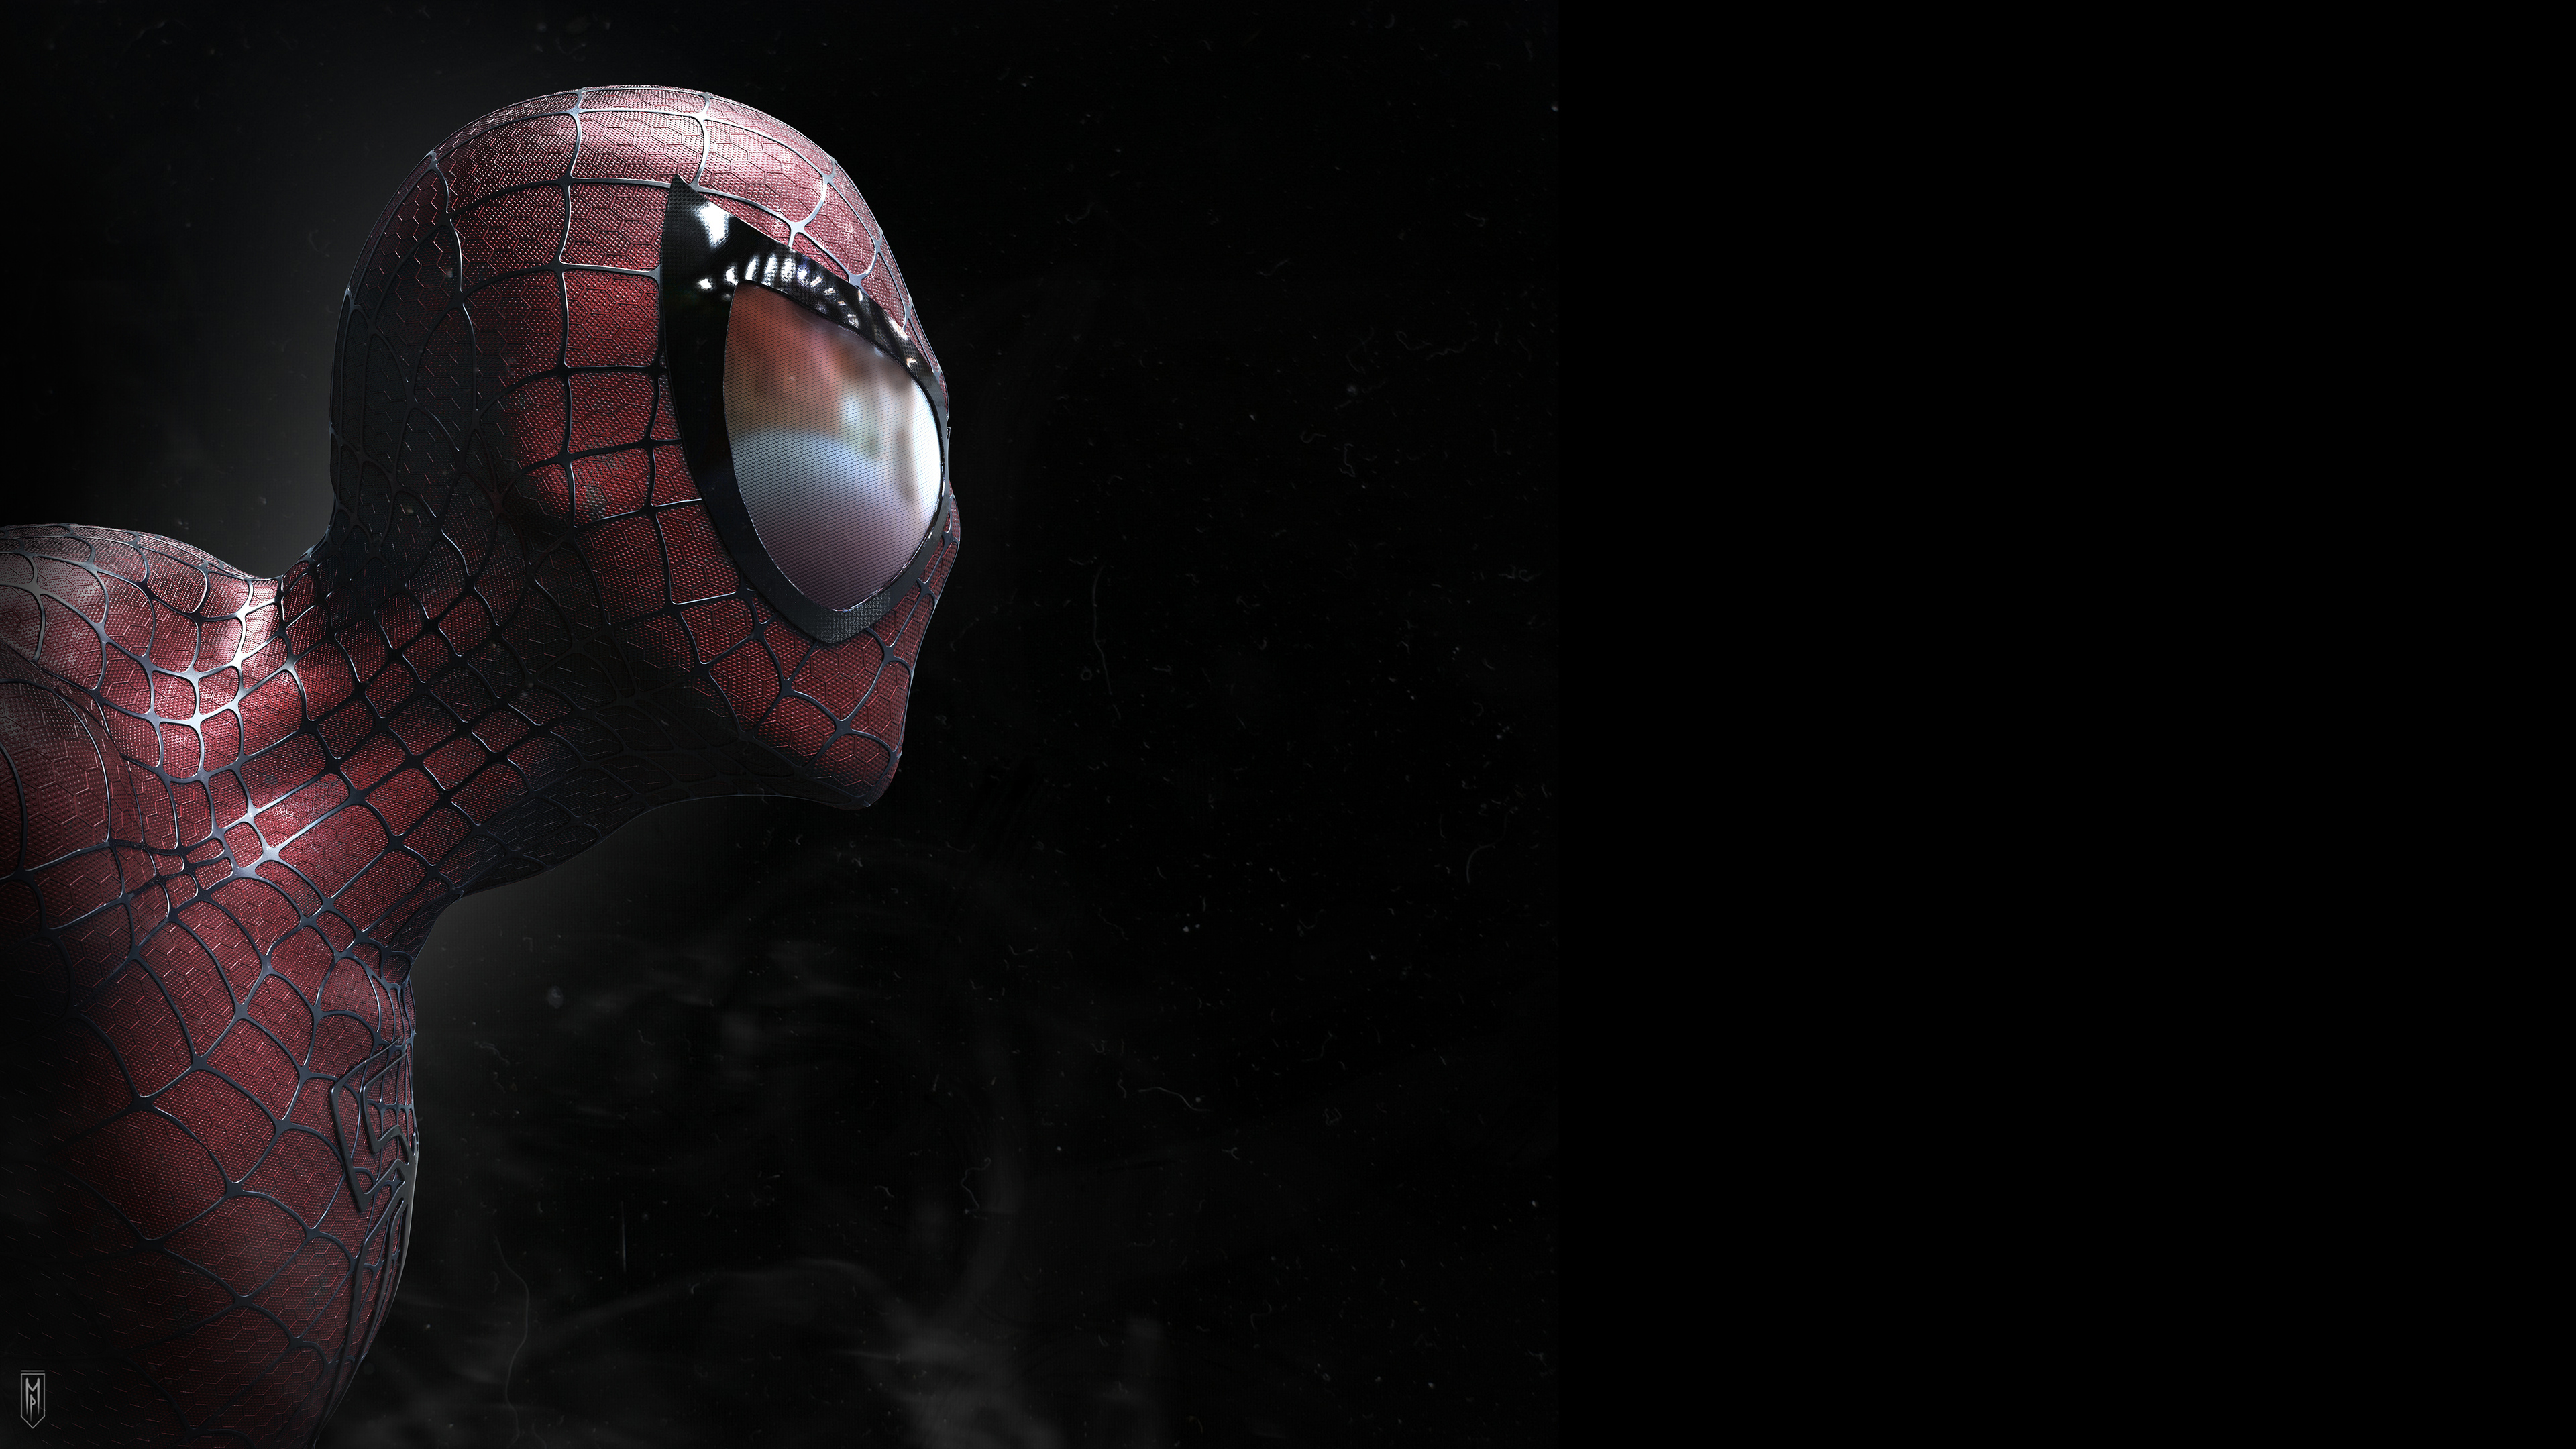 spiderman 5k art 1536522728 - Spiderman 5k Art - superheroes wallpapers, spiderman wallpapers, hd-wallpapers, digital art wallpapers, artwork wallpapers, artist wallpapers, art wallpapers, 5k wallpapers, 4k-wallpapers